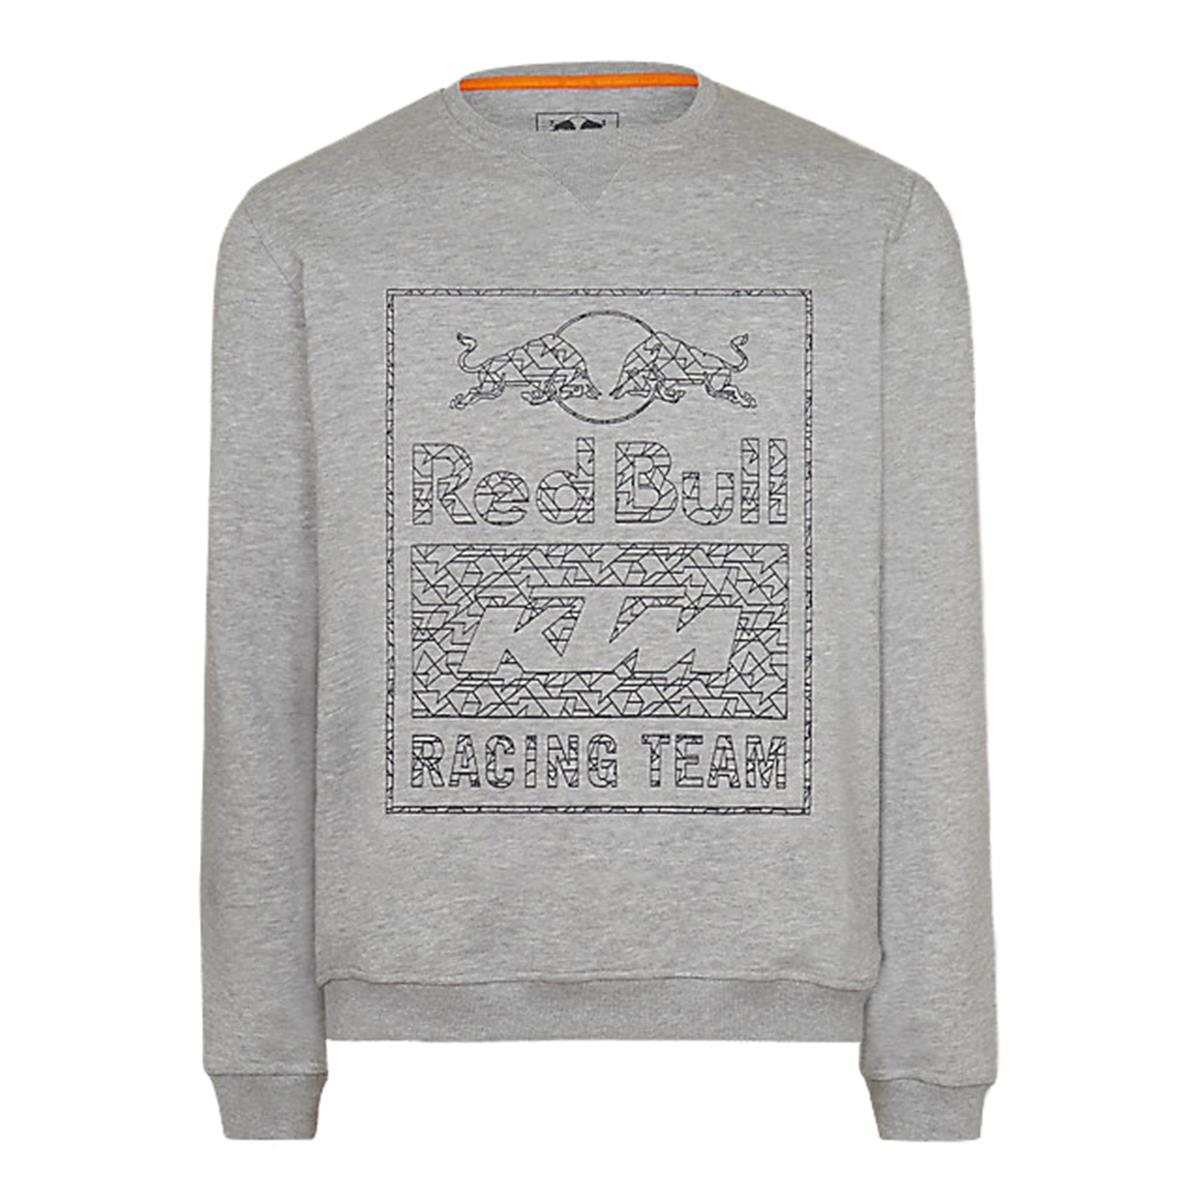 Red Bull Sweatshirt KTM Wireframe Crewn Grau